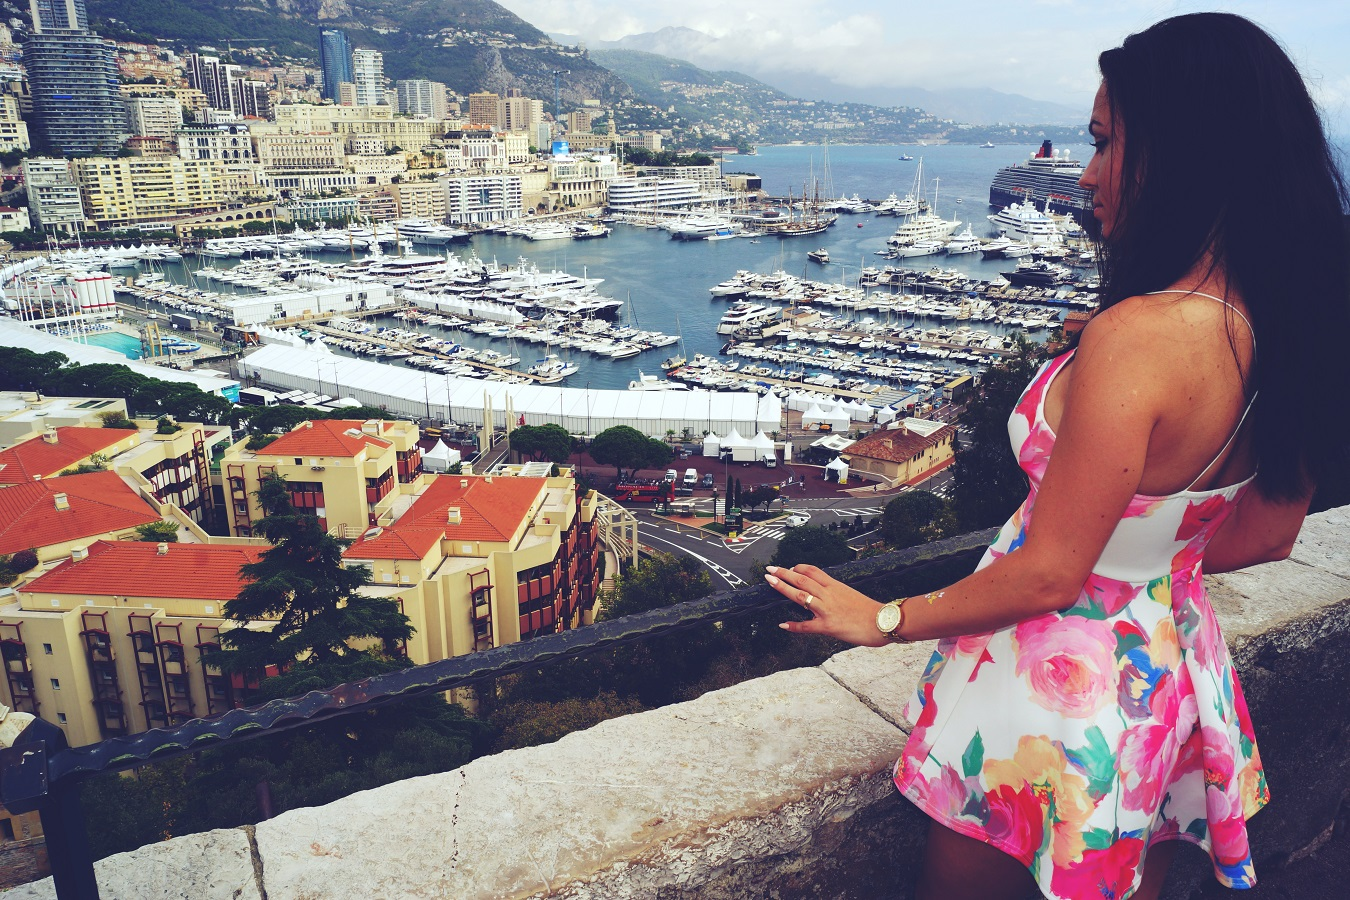 Views of Monte Carlo